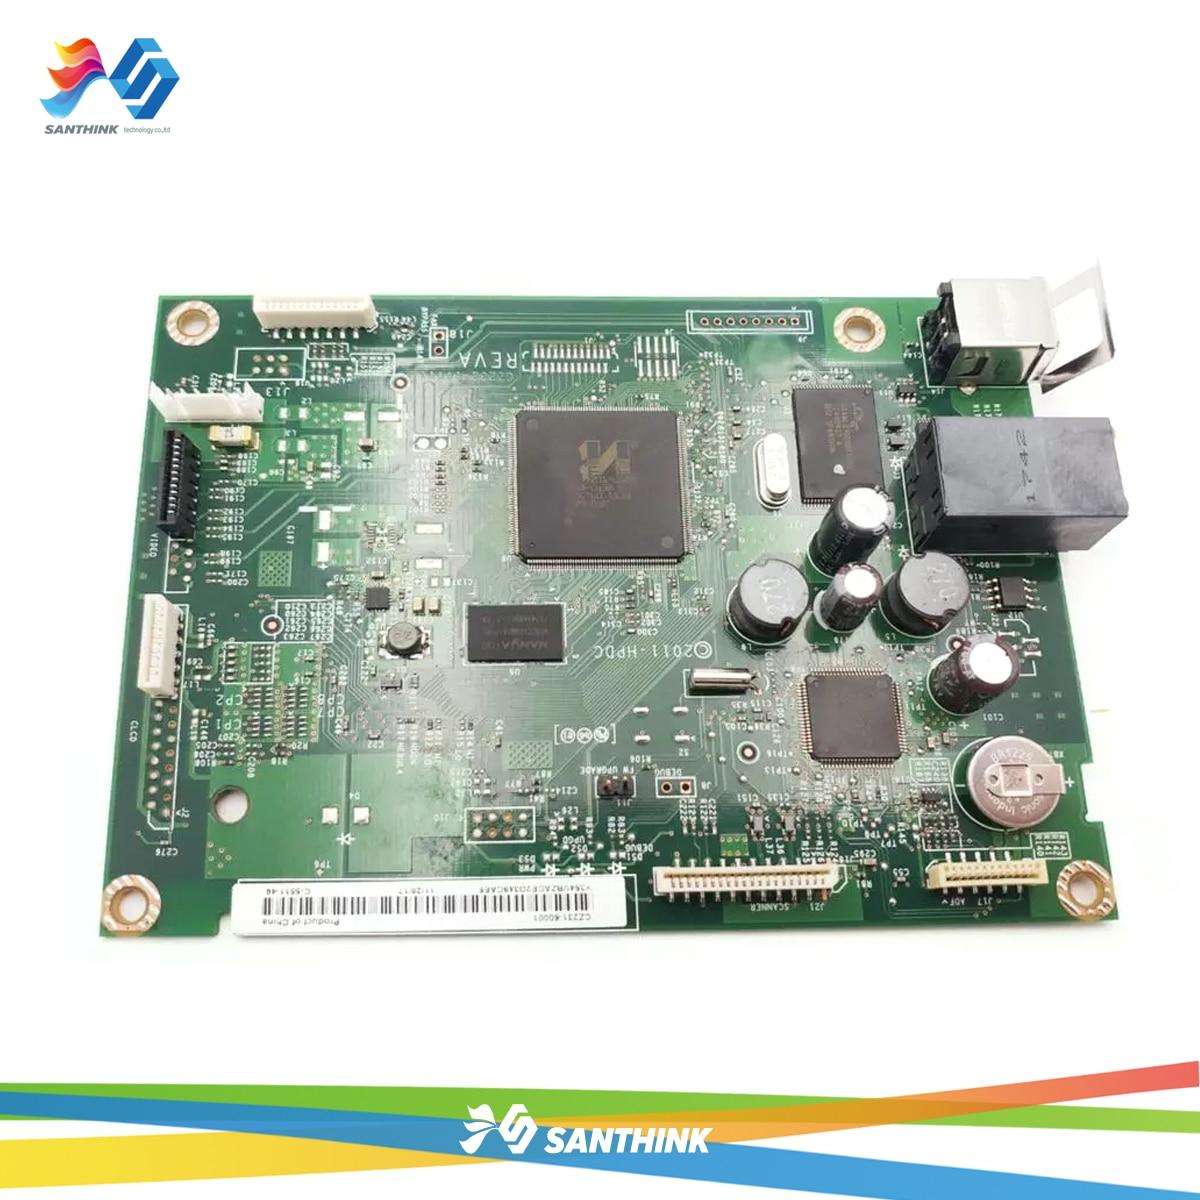 CZ231-60001 Logic Main Board For HP M225dn M226dn M225 M226 225 226 225dn 226dn Formatter Board Mainboard